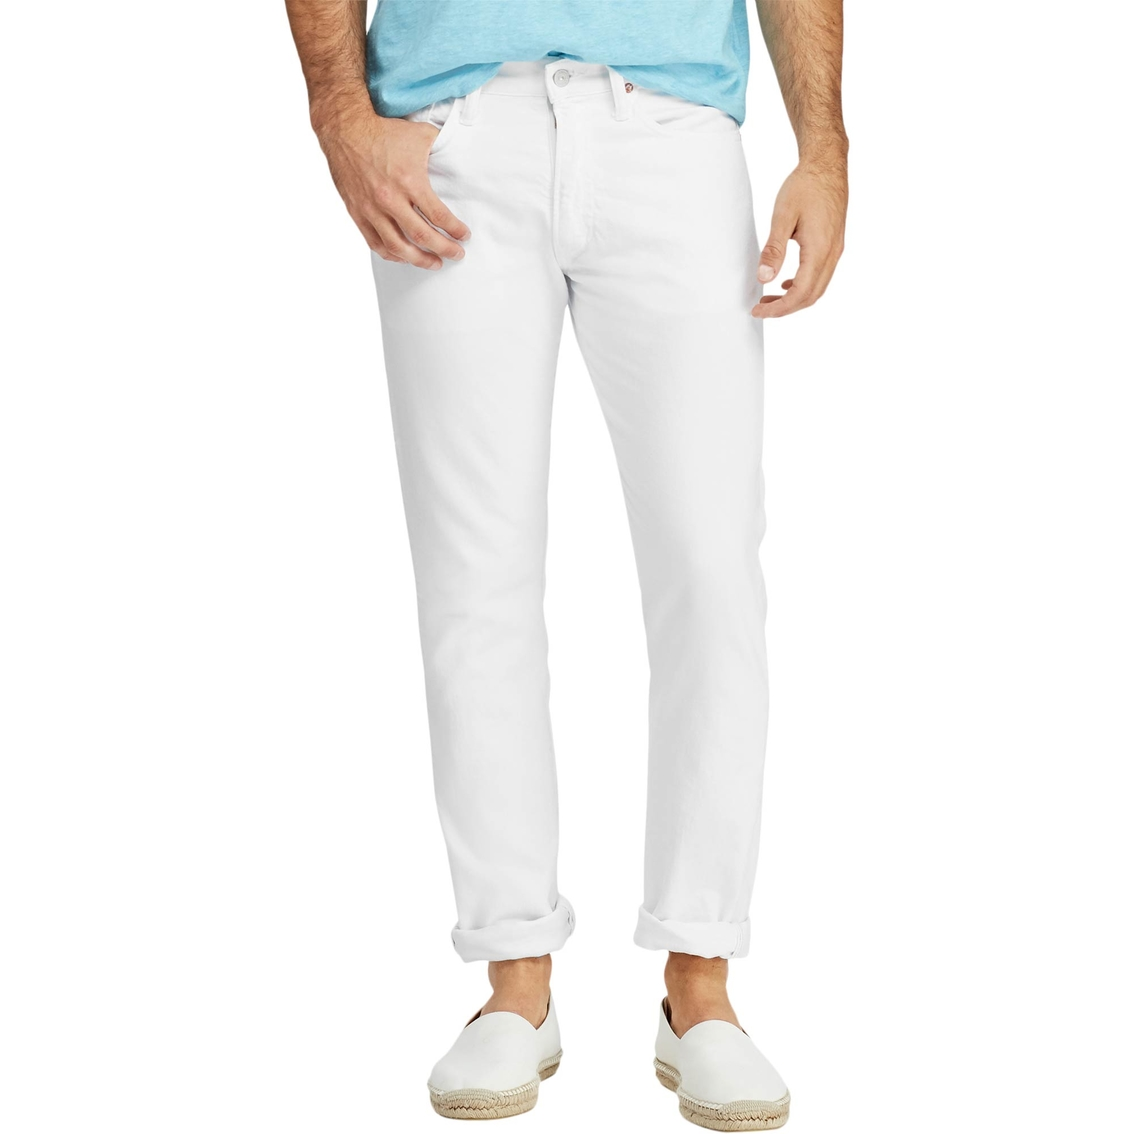 6a0819d6c Polo Ralph Lauren Varick Slim Straight Stretch Jeans